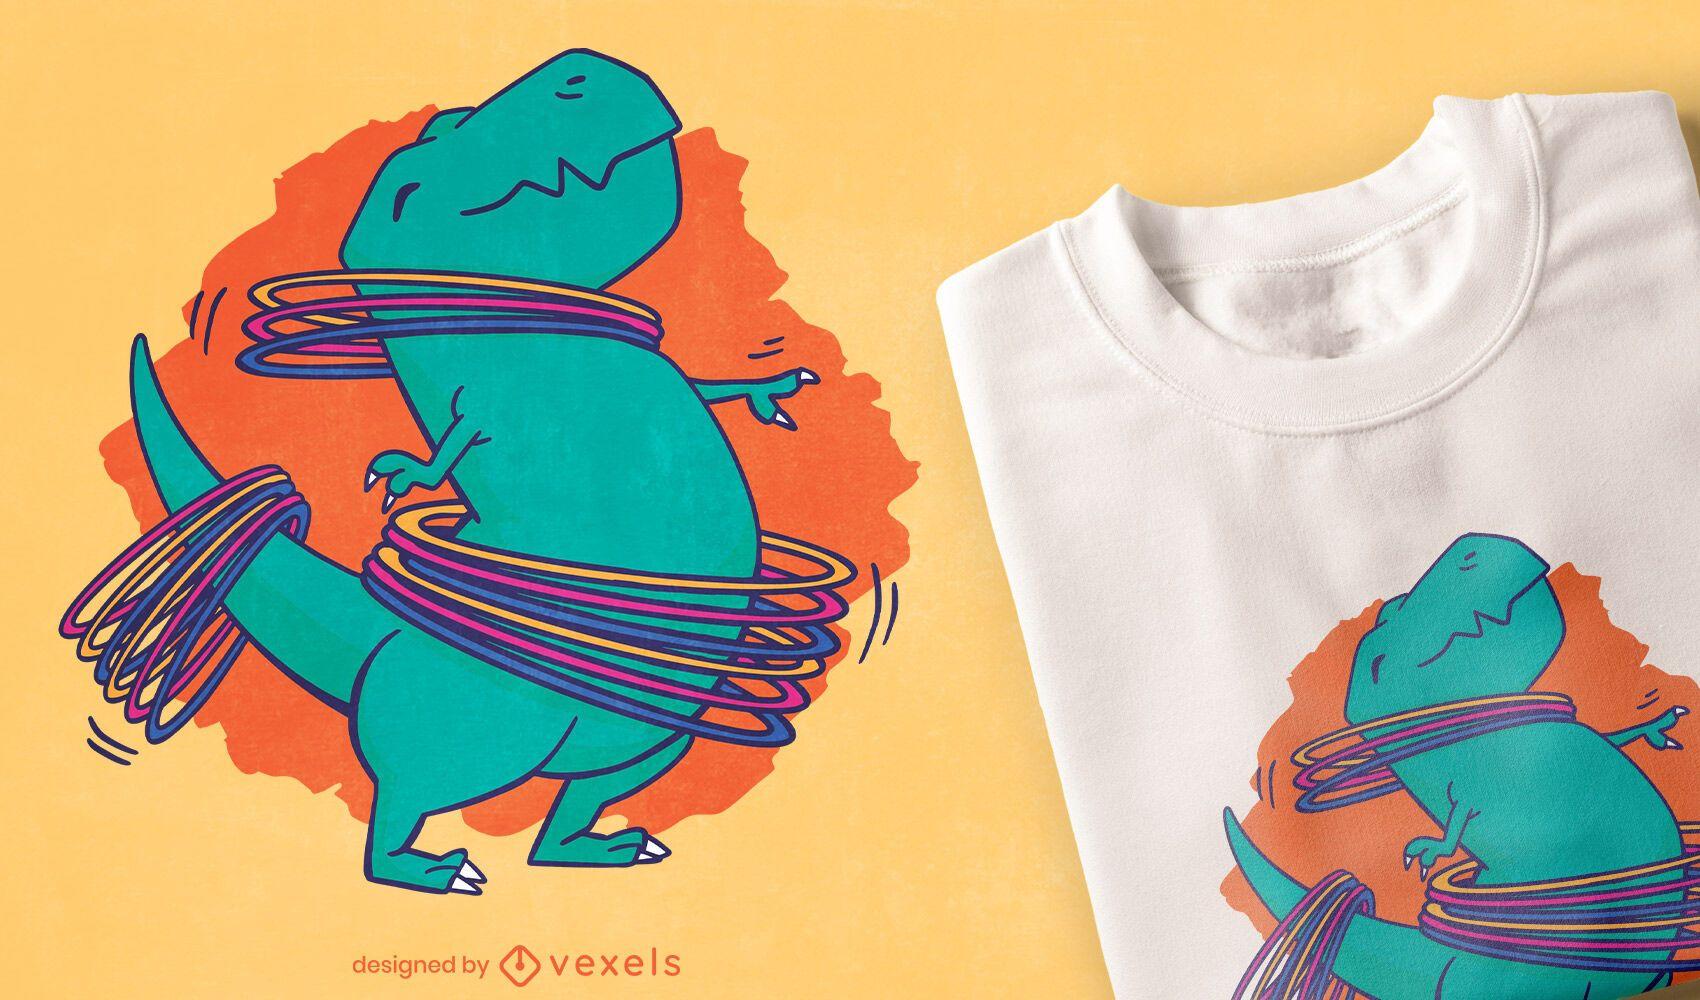 Niedliches T-Rex-Dinosaurier-Hula-Hoop-T-Shirt-Design